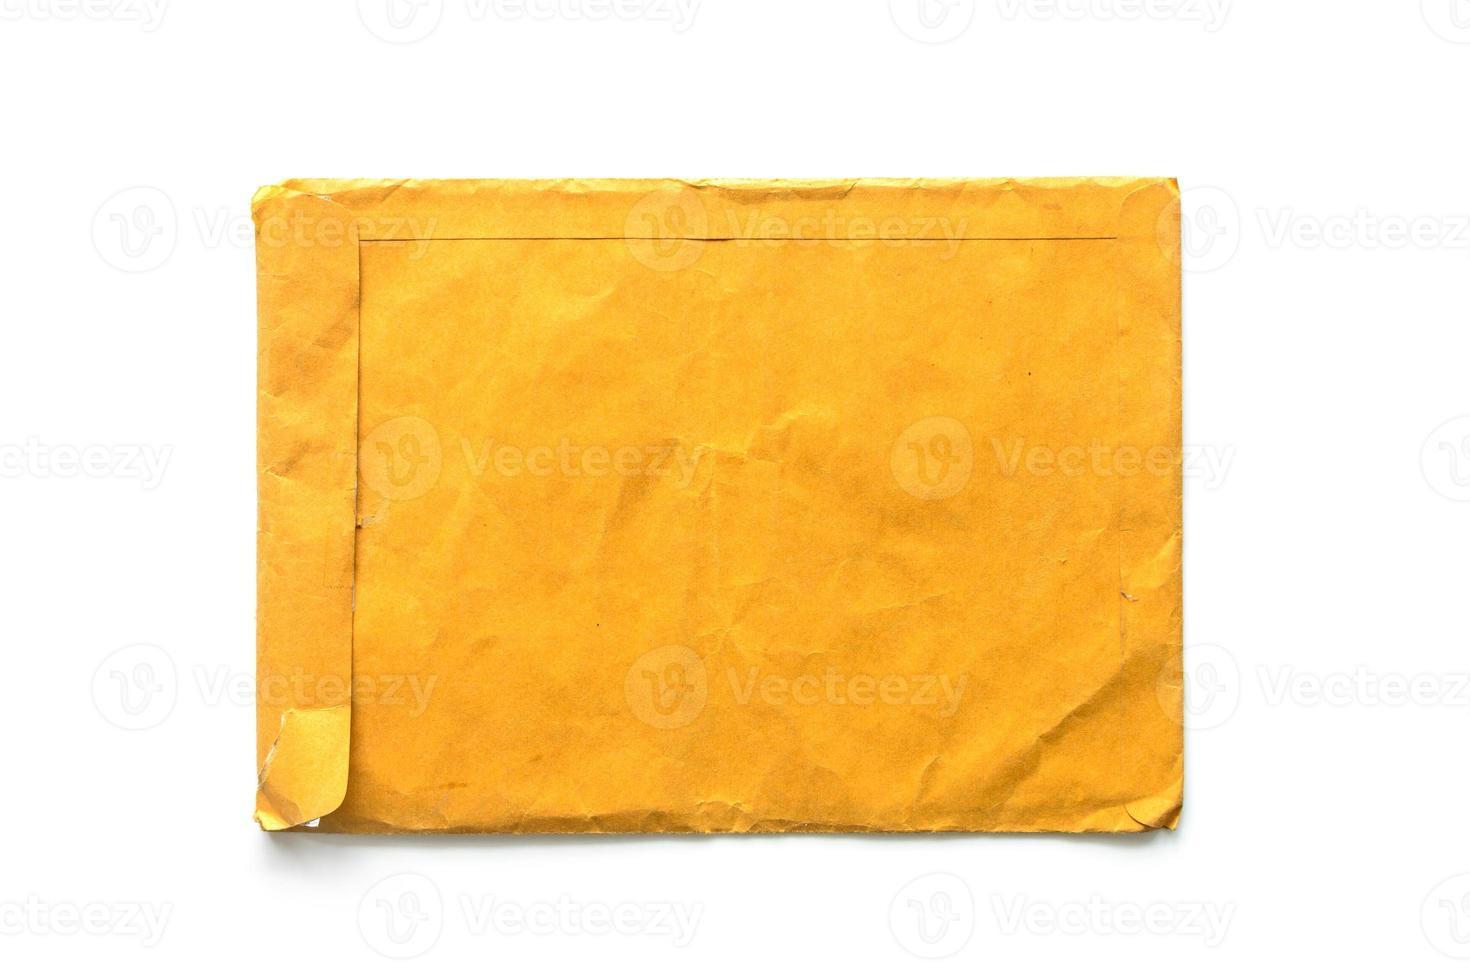 documento de envelope marrom no fundo branco foto